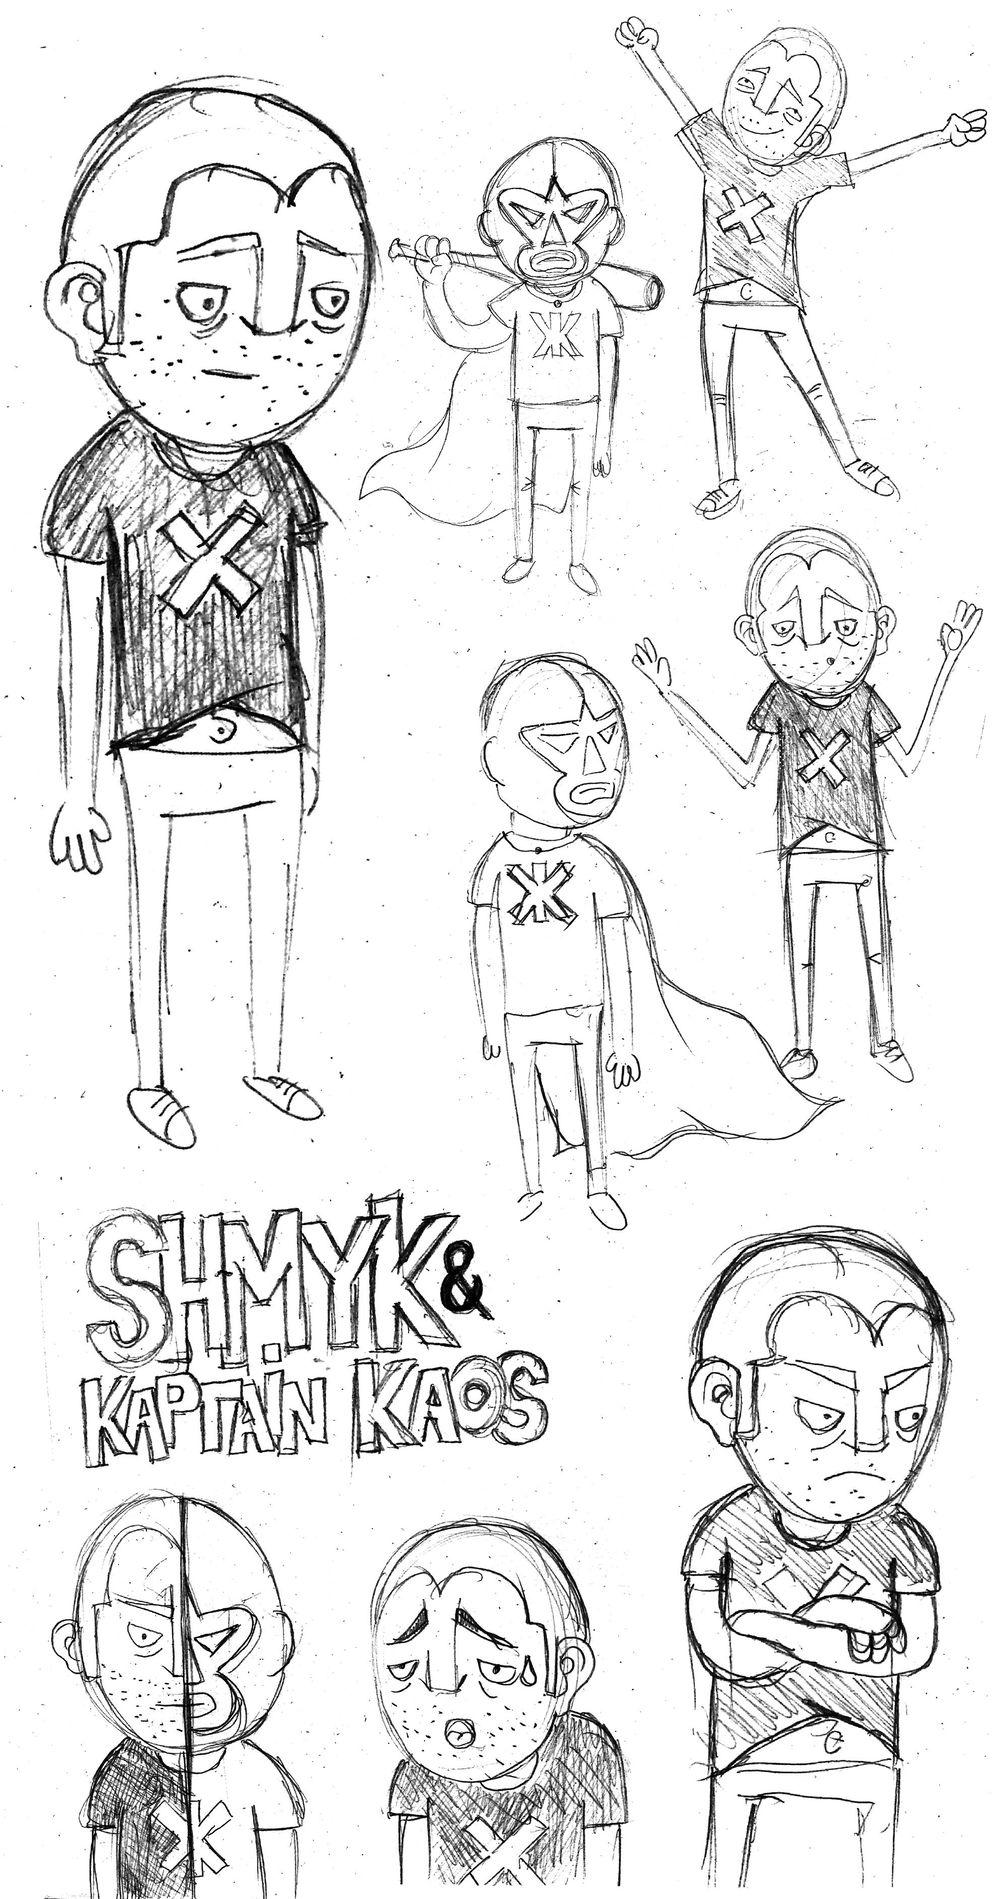 Shmykk & Kaptain Kaos - image 1 - student project